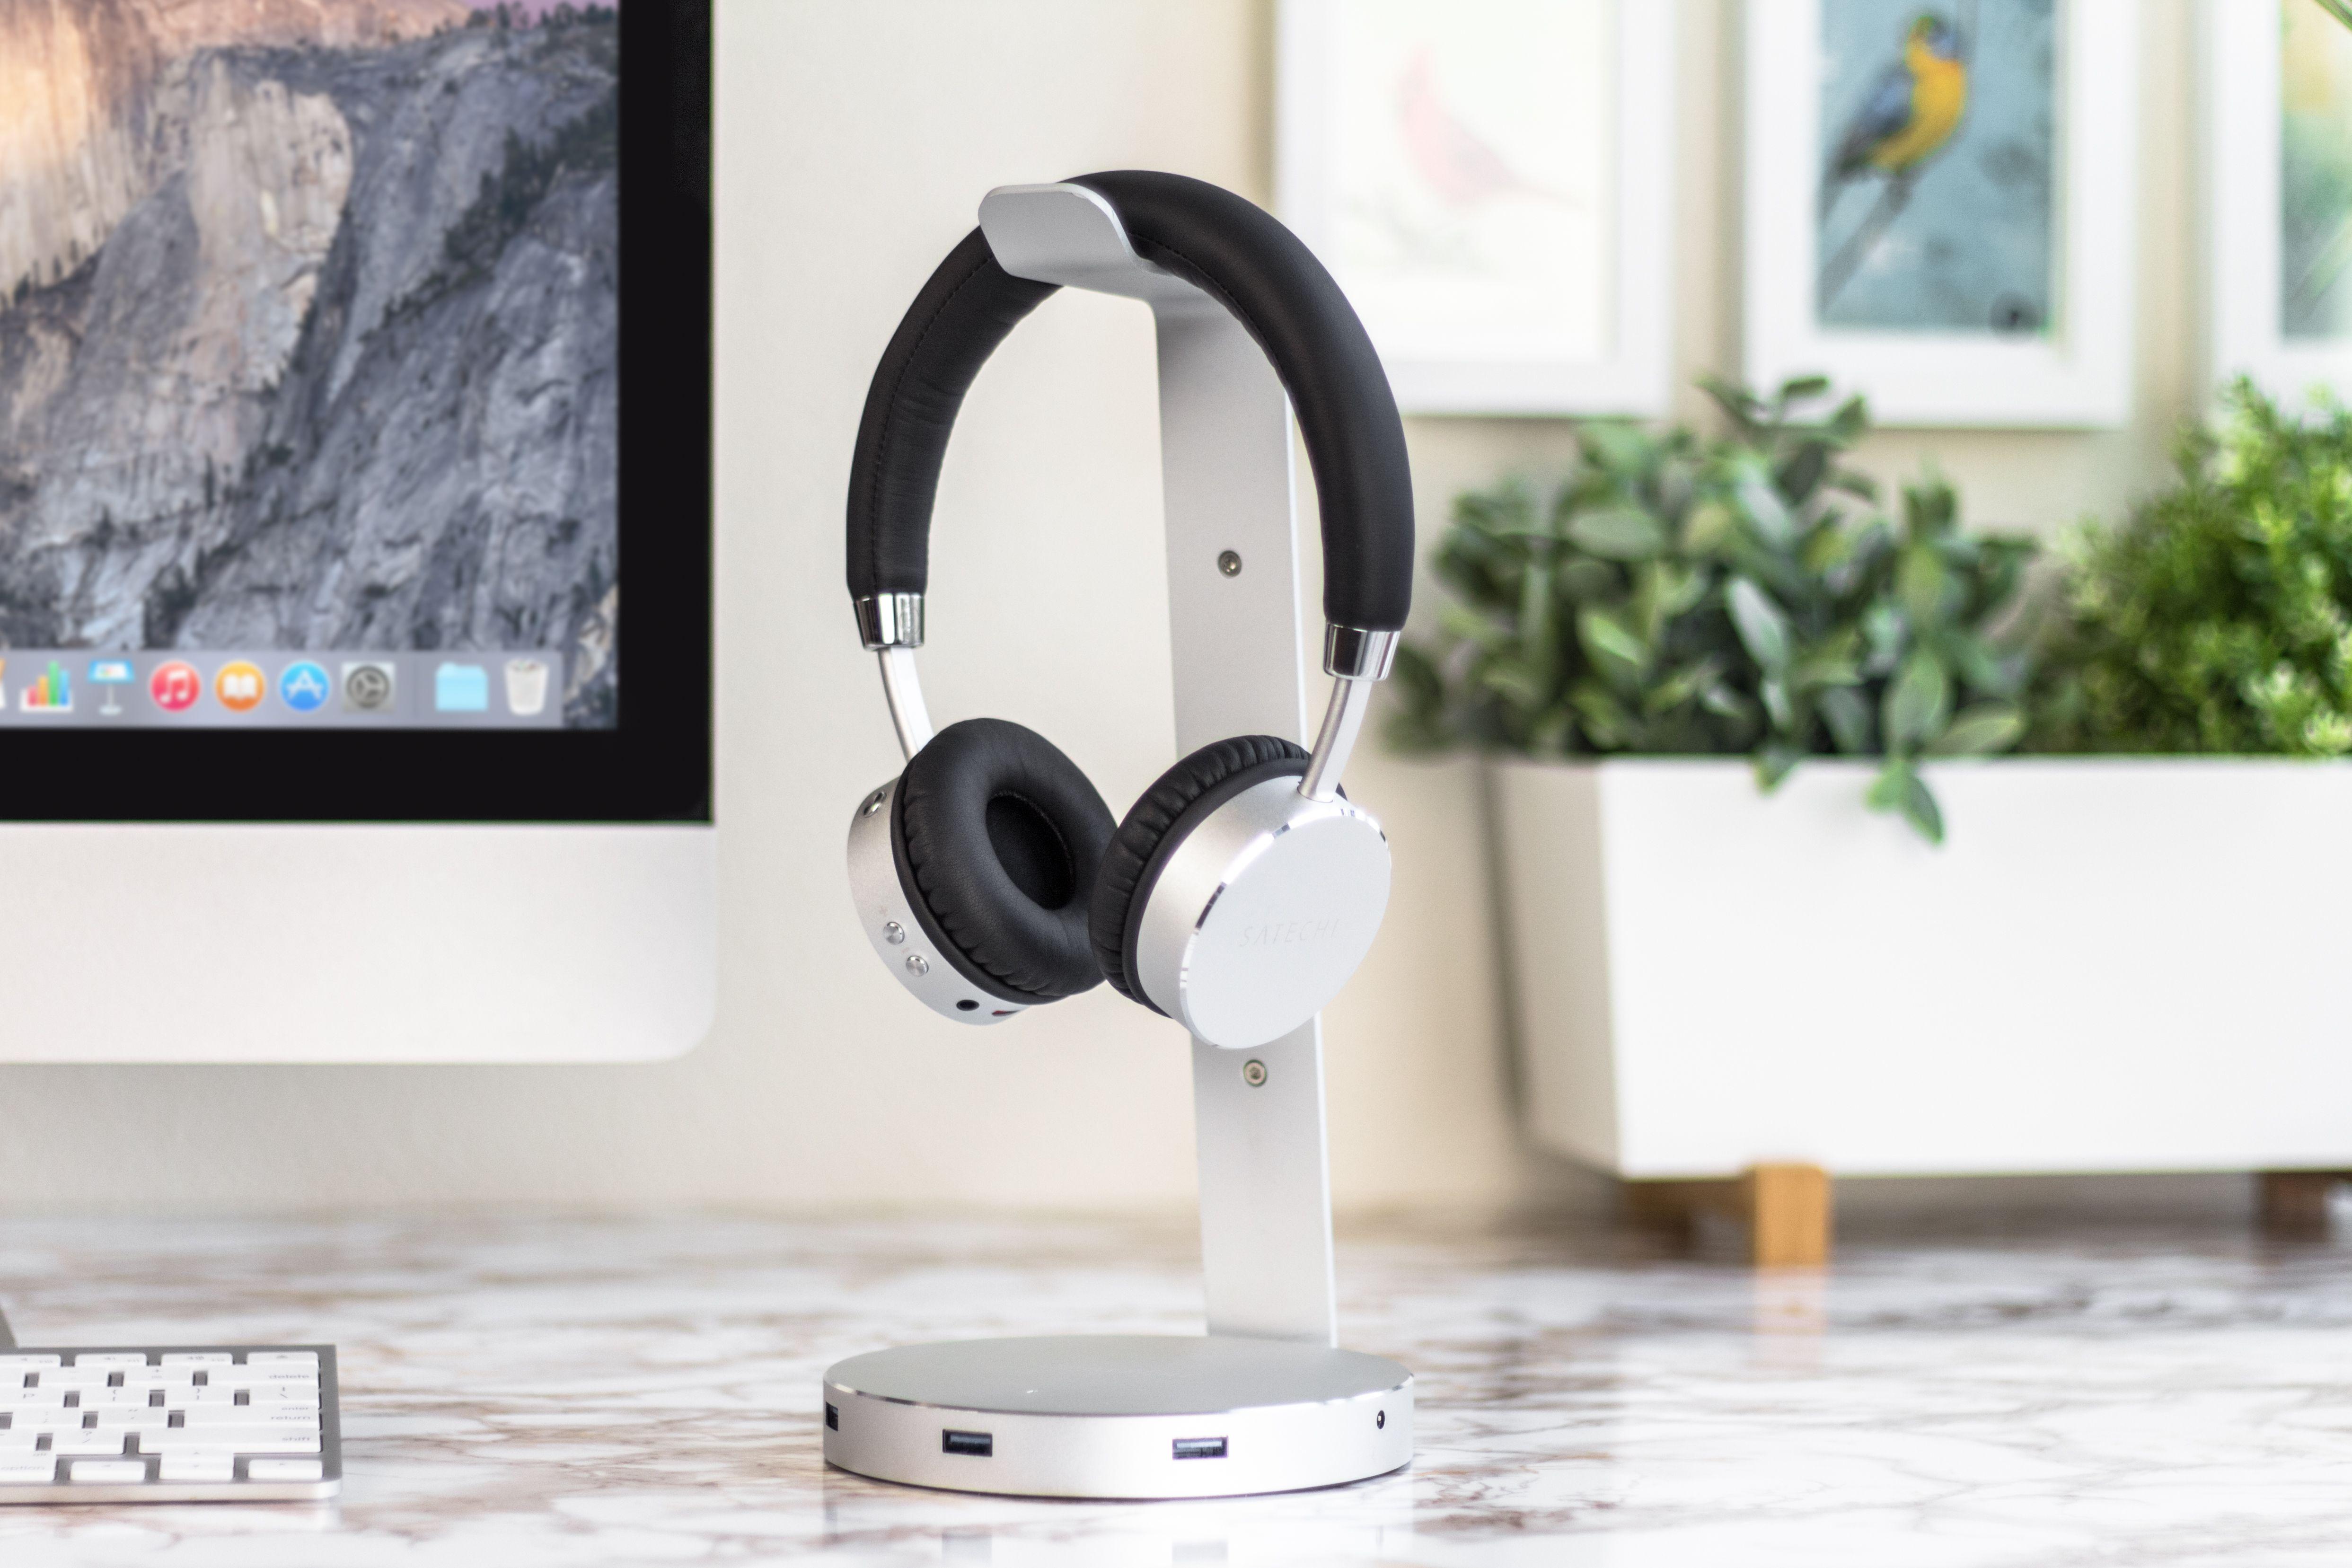 eac7c41a132 Satechi Aluminum Headset Stand & USB Hub and Aluminum Wireless Headphones